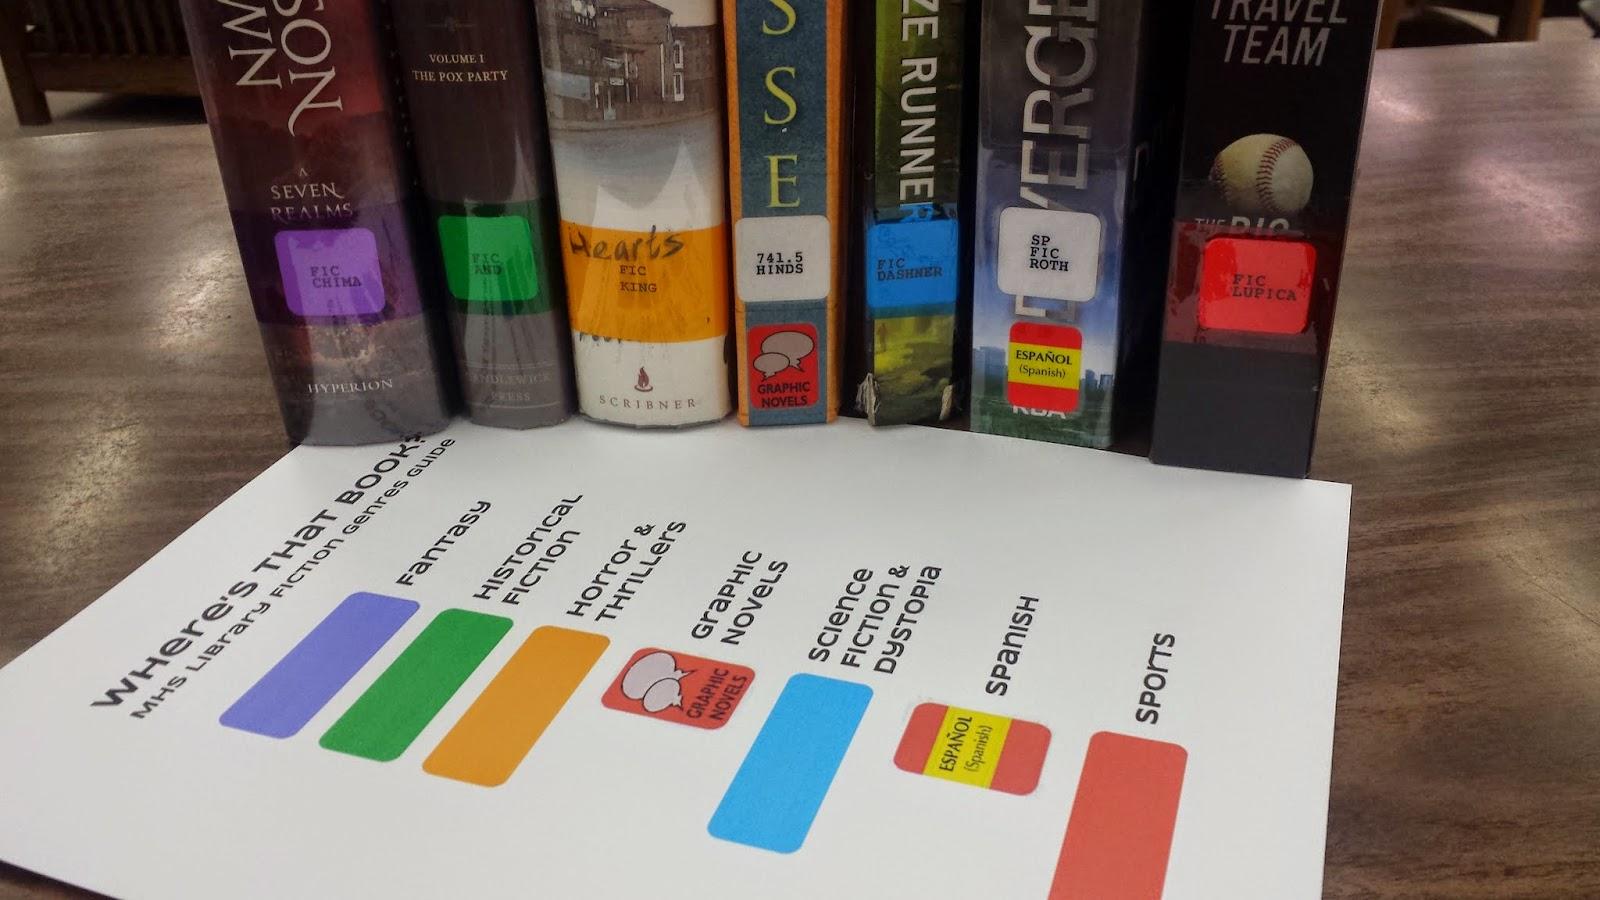 Realistic Fiction Label Leaving Realistic Fiction